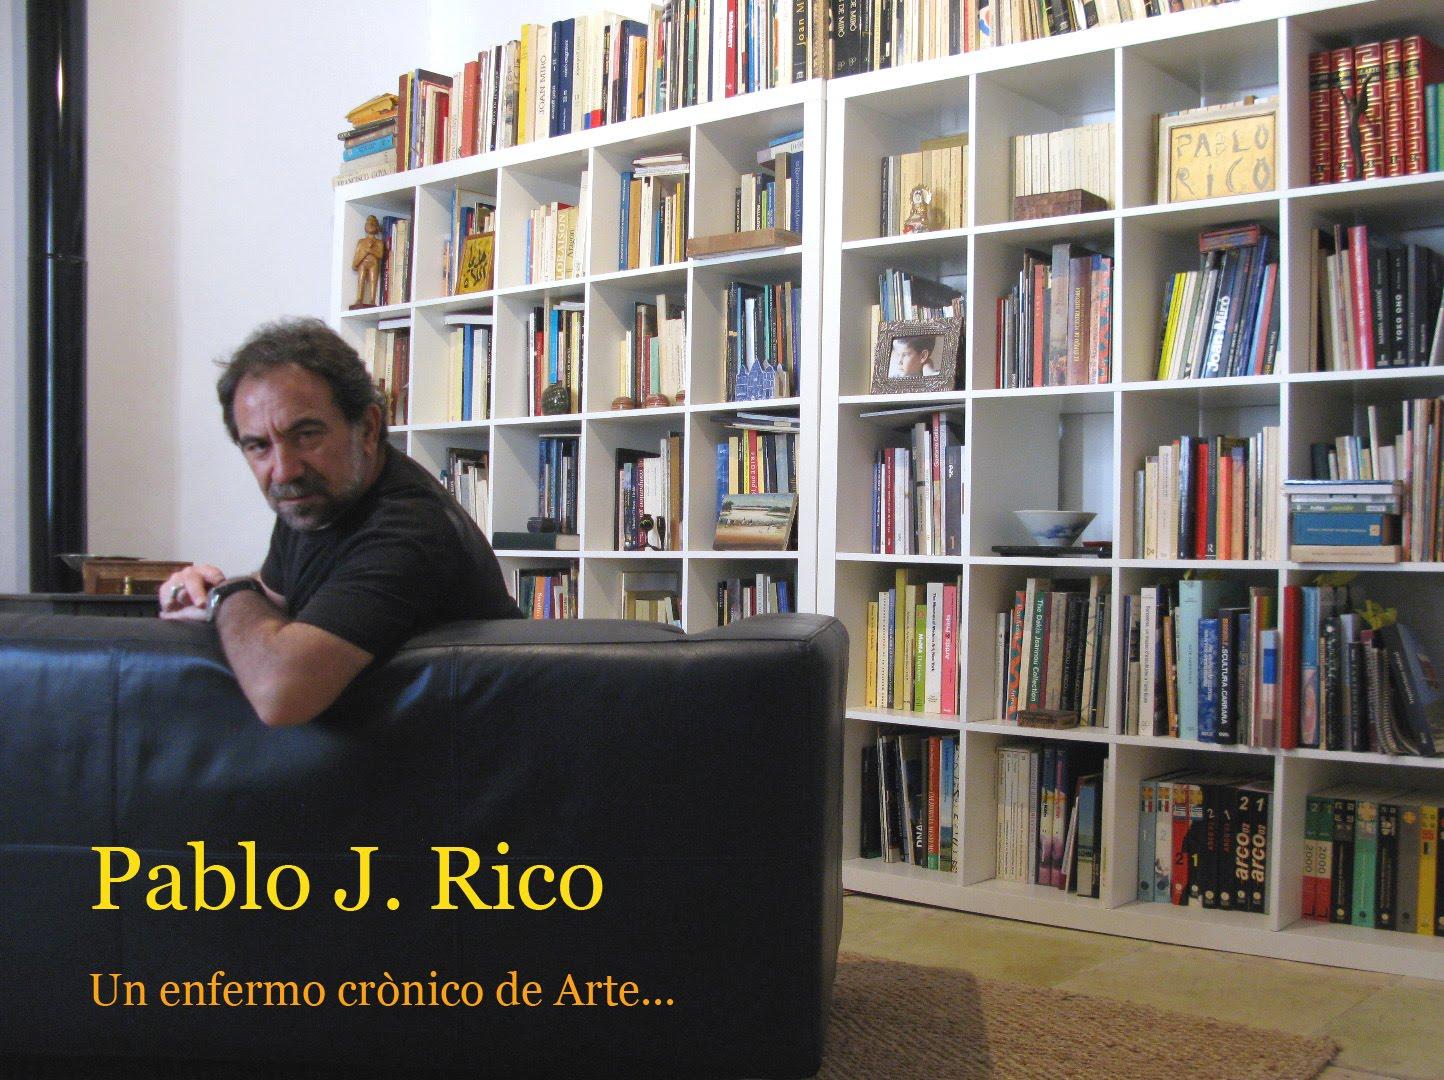 Pablo J. Rico